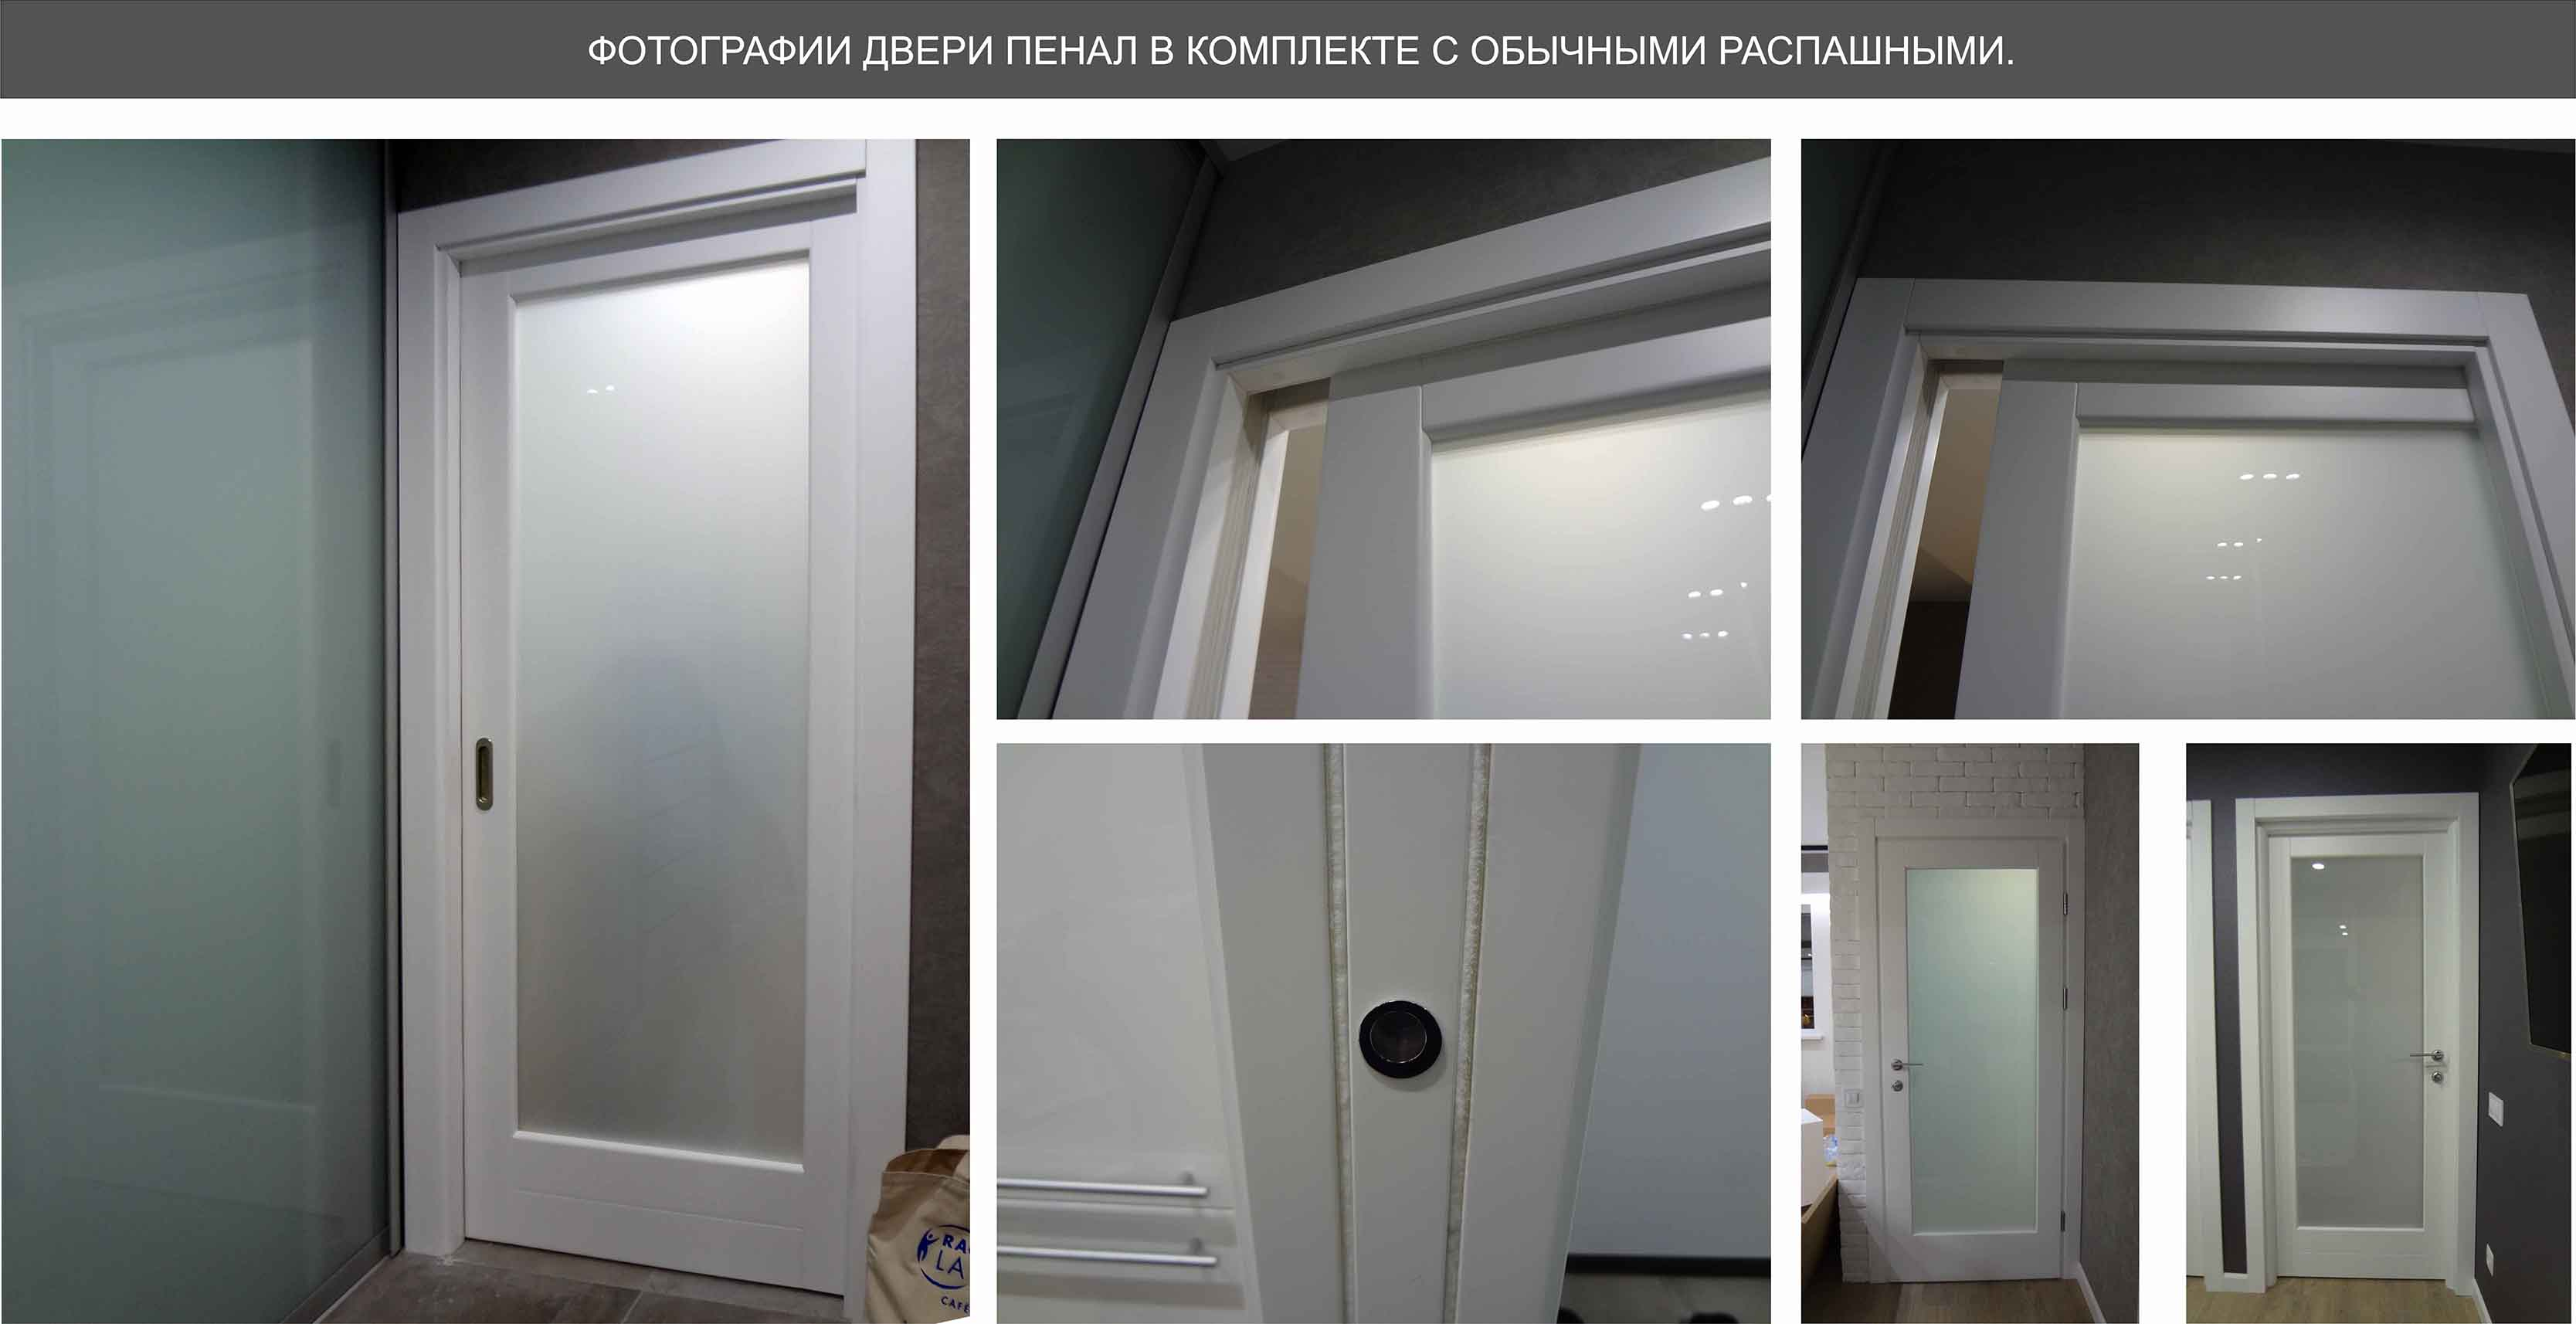 dveri-penal-fotografiya